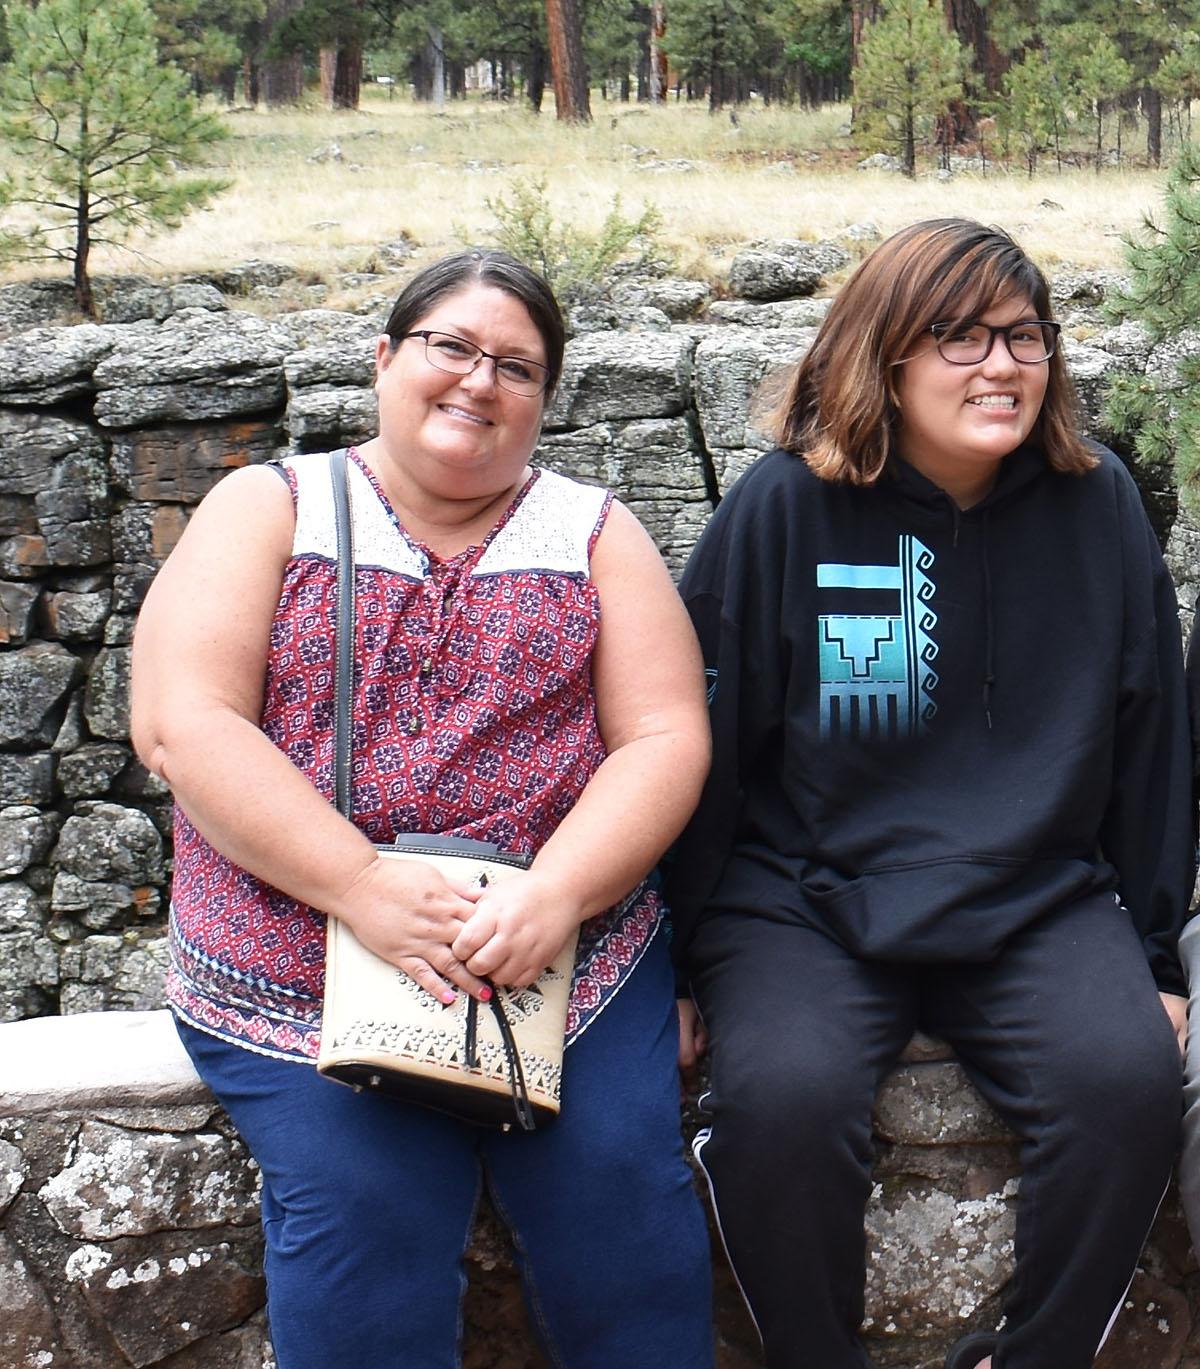 "Kalamazoo Public Schools faculty member Robin Greymountain (left) and Loy Norrix High School freshman Aanje Greymountain (right) posing at the edge of ""Assini Aglay Bigun"" in Flagstaff, AZ, during a trip back to their home in Arizona. ""Assini Aglay Bigun"" is a sacred mountain in Navajo culture, and the location where Aanje Greymountain and her sister NaMe Greymountain (not pictured) were born."